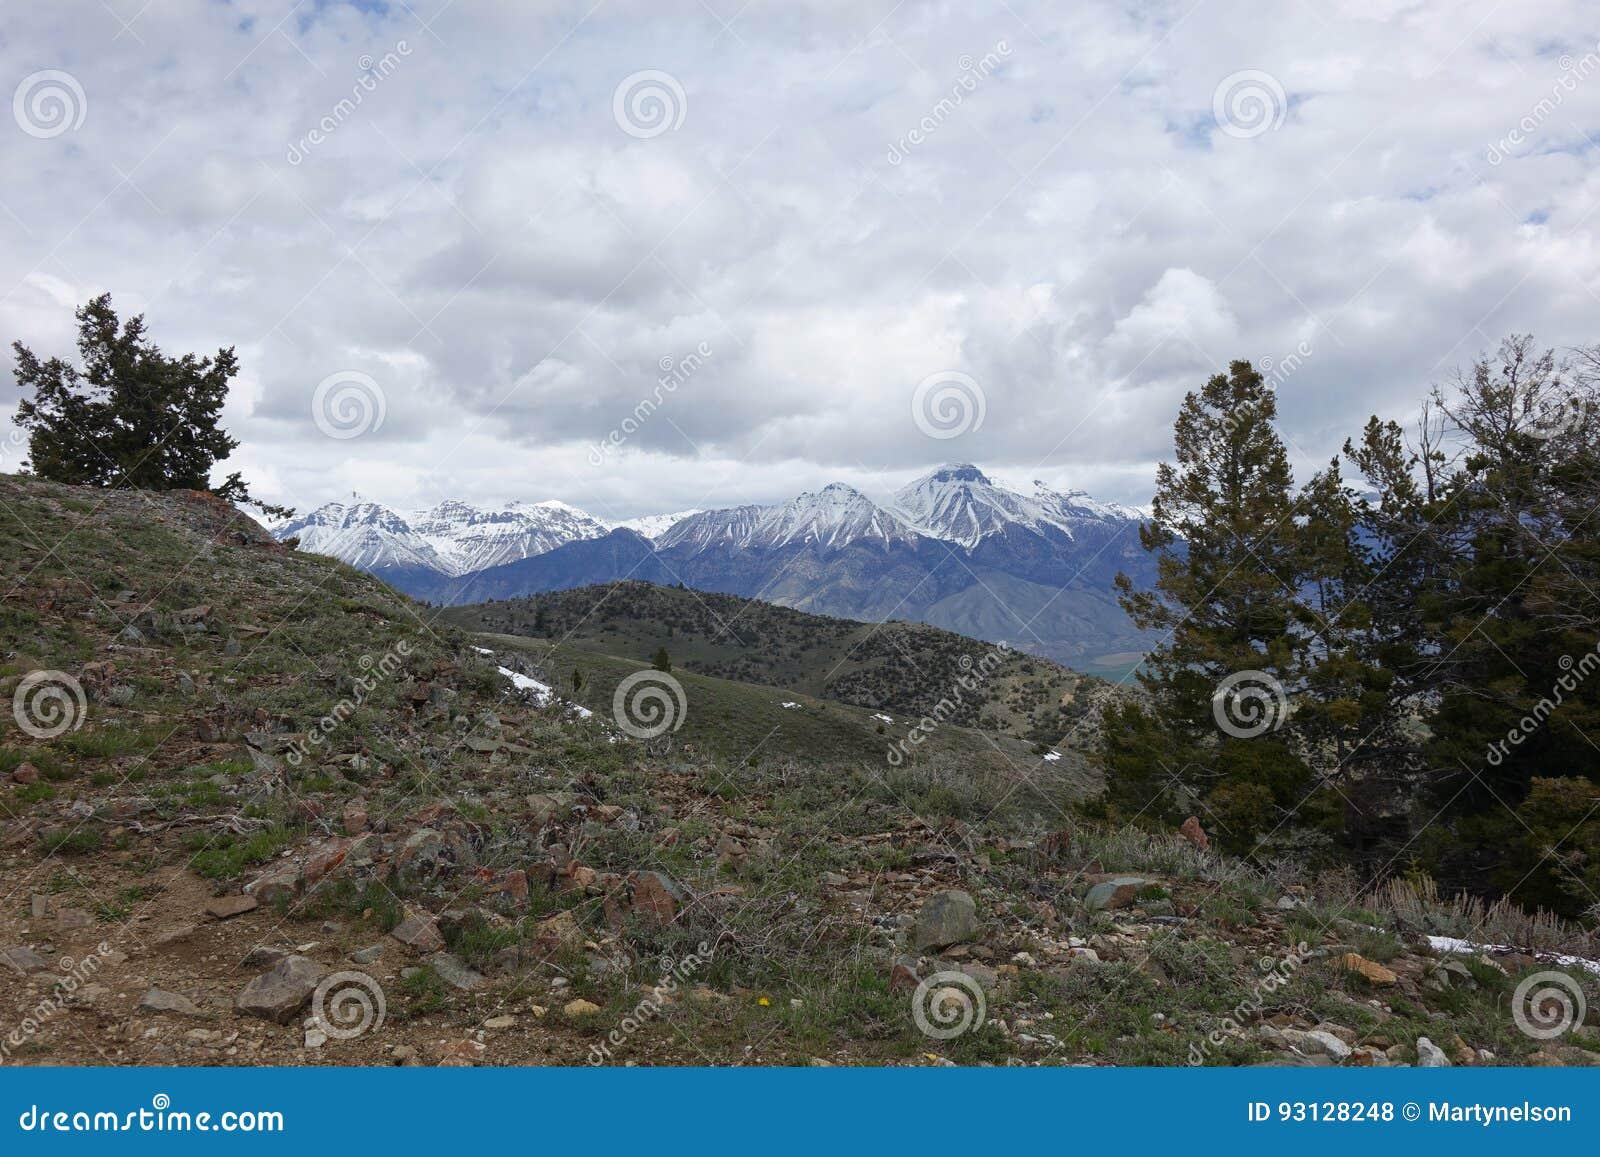 Mt McCaleb - Mackay, Idaho